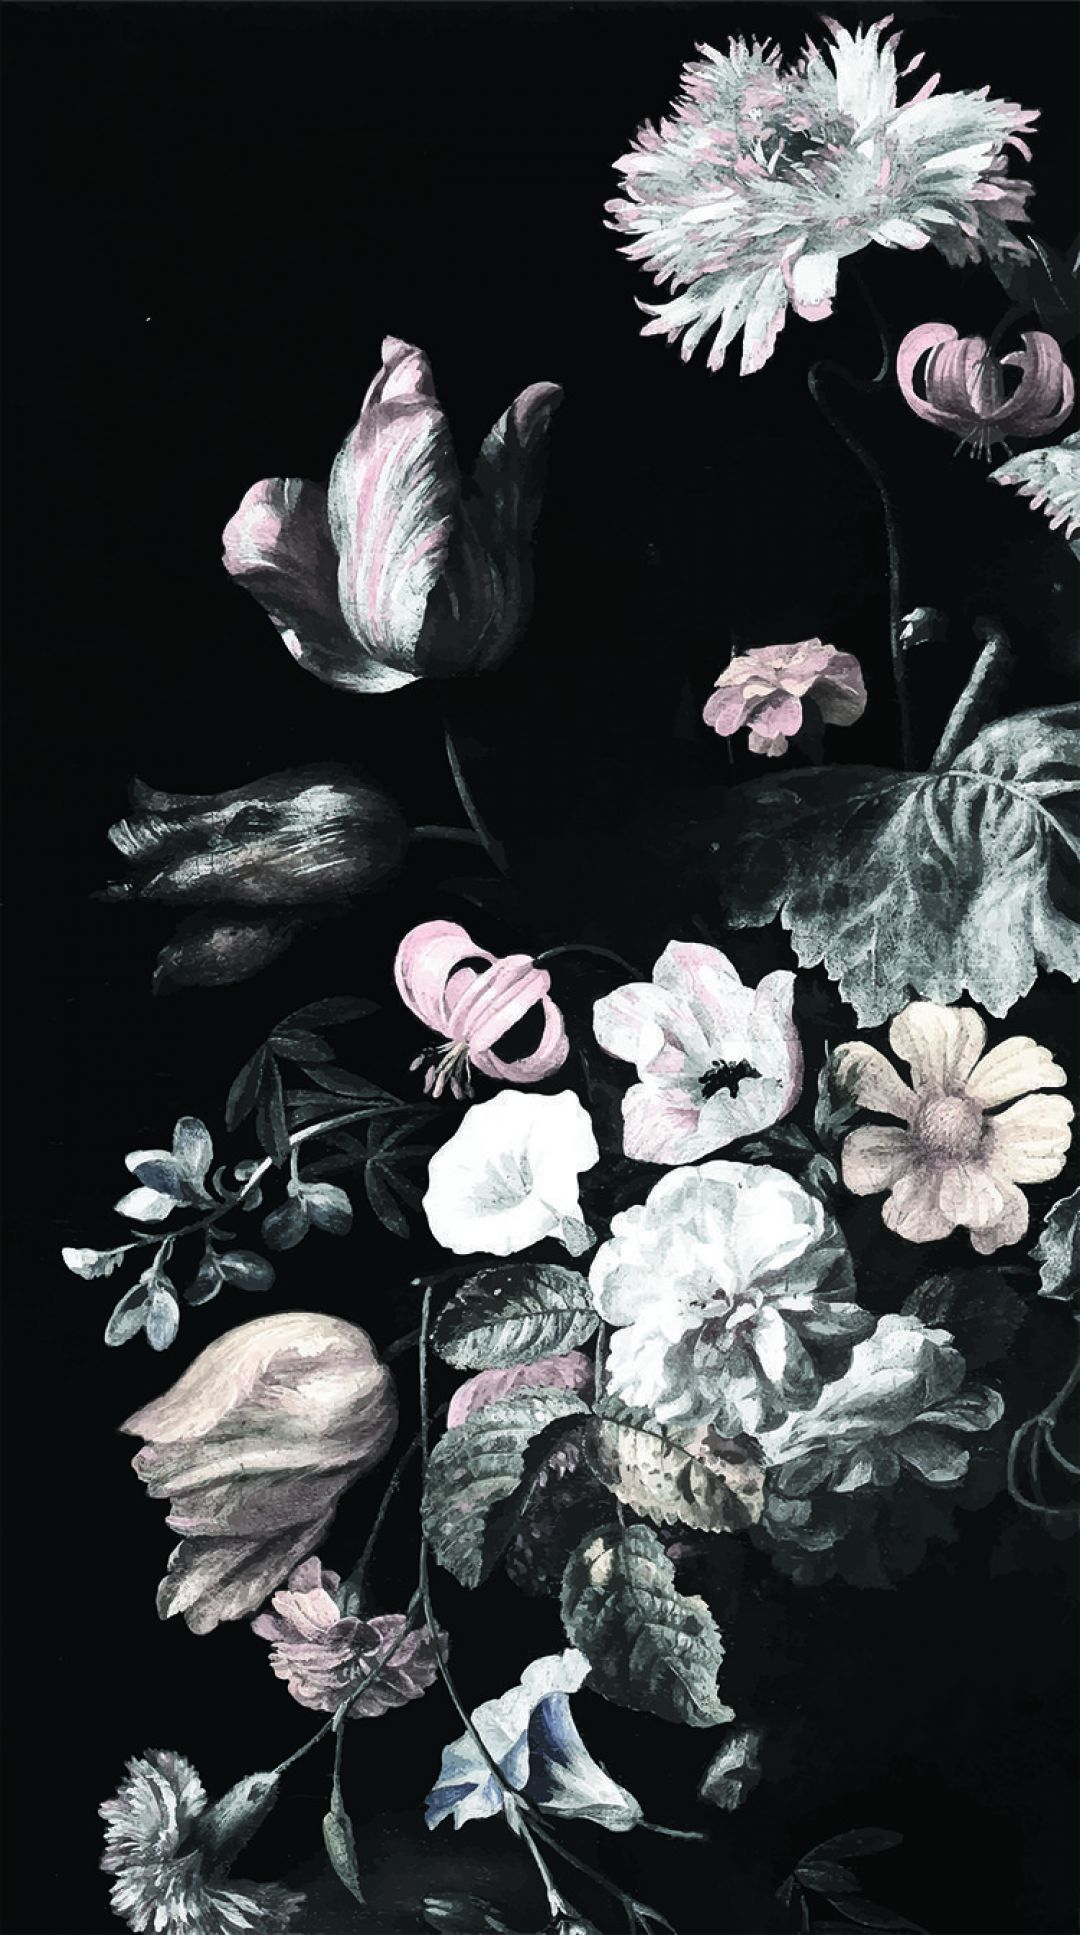 White Flower Aesthetic Wallpapers Wallpaper Cave